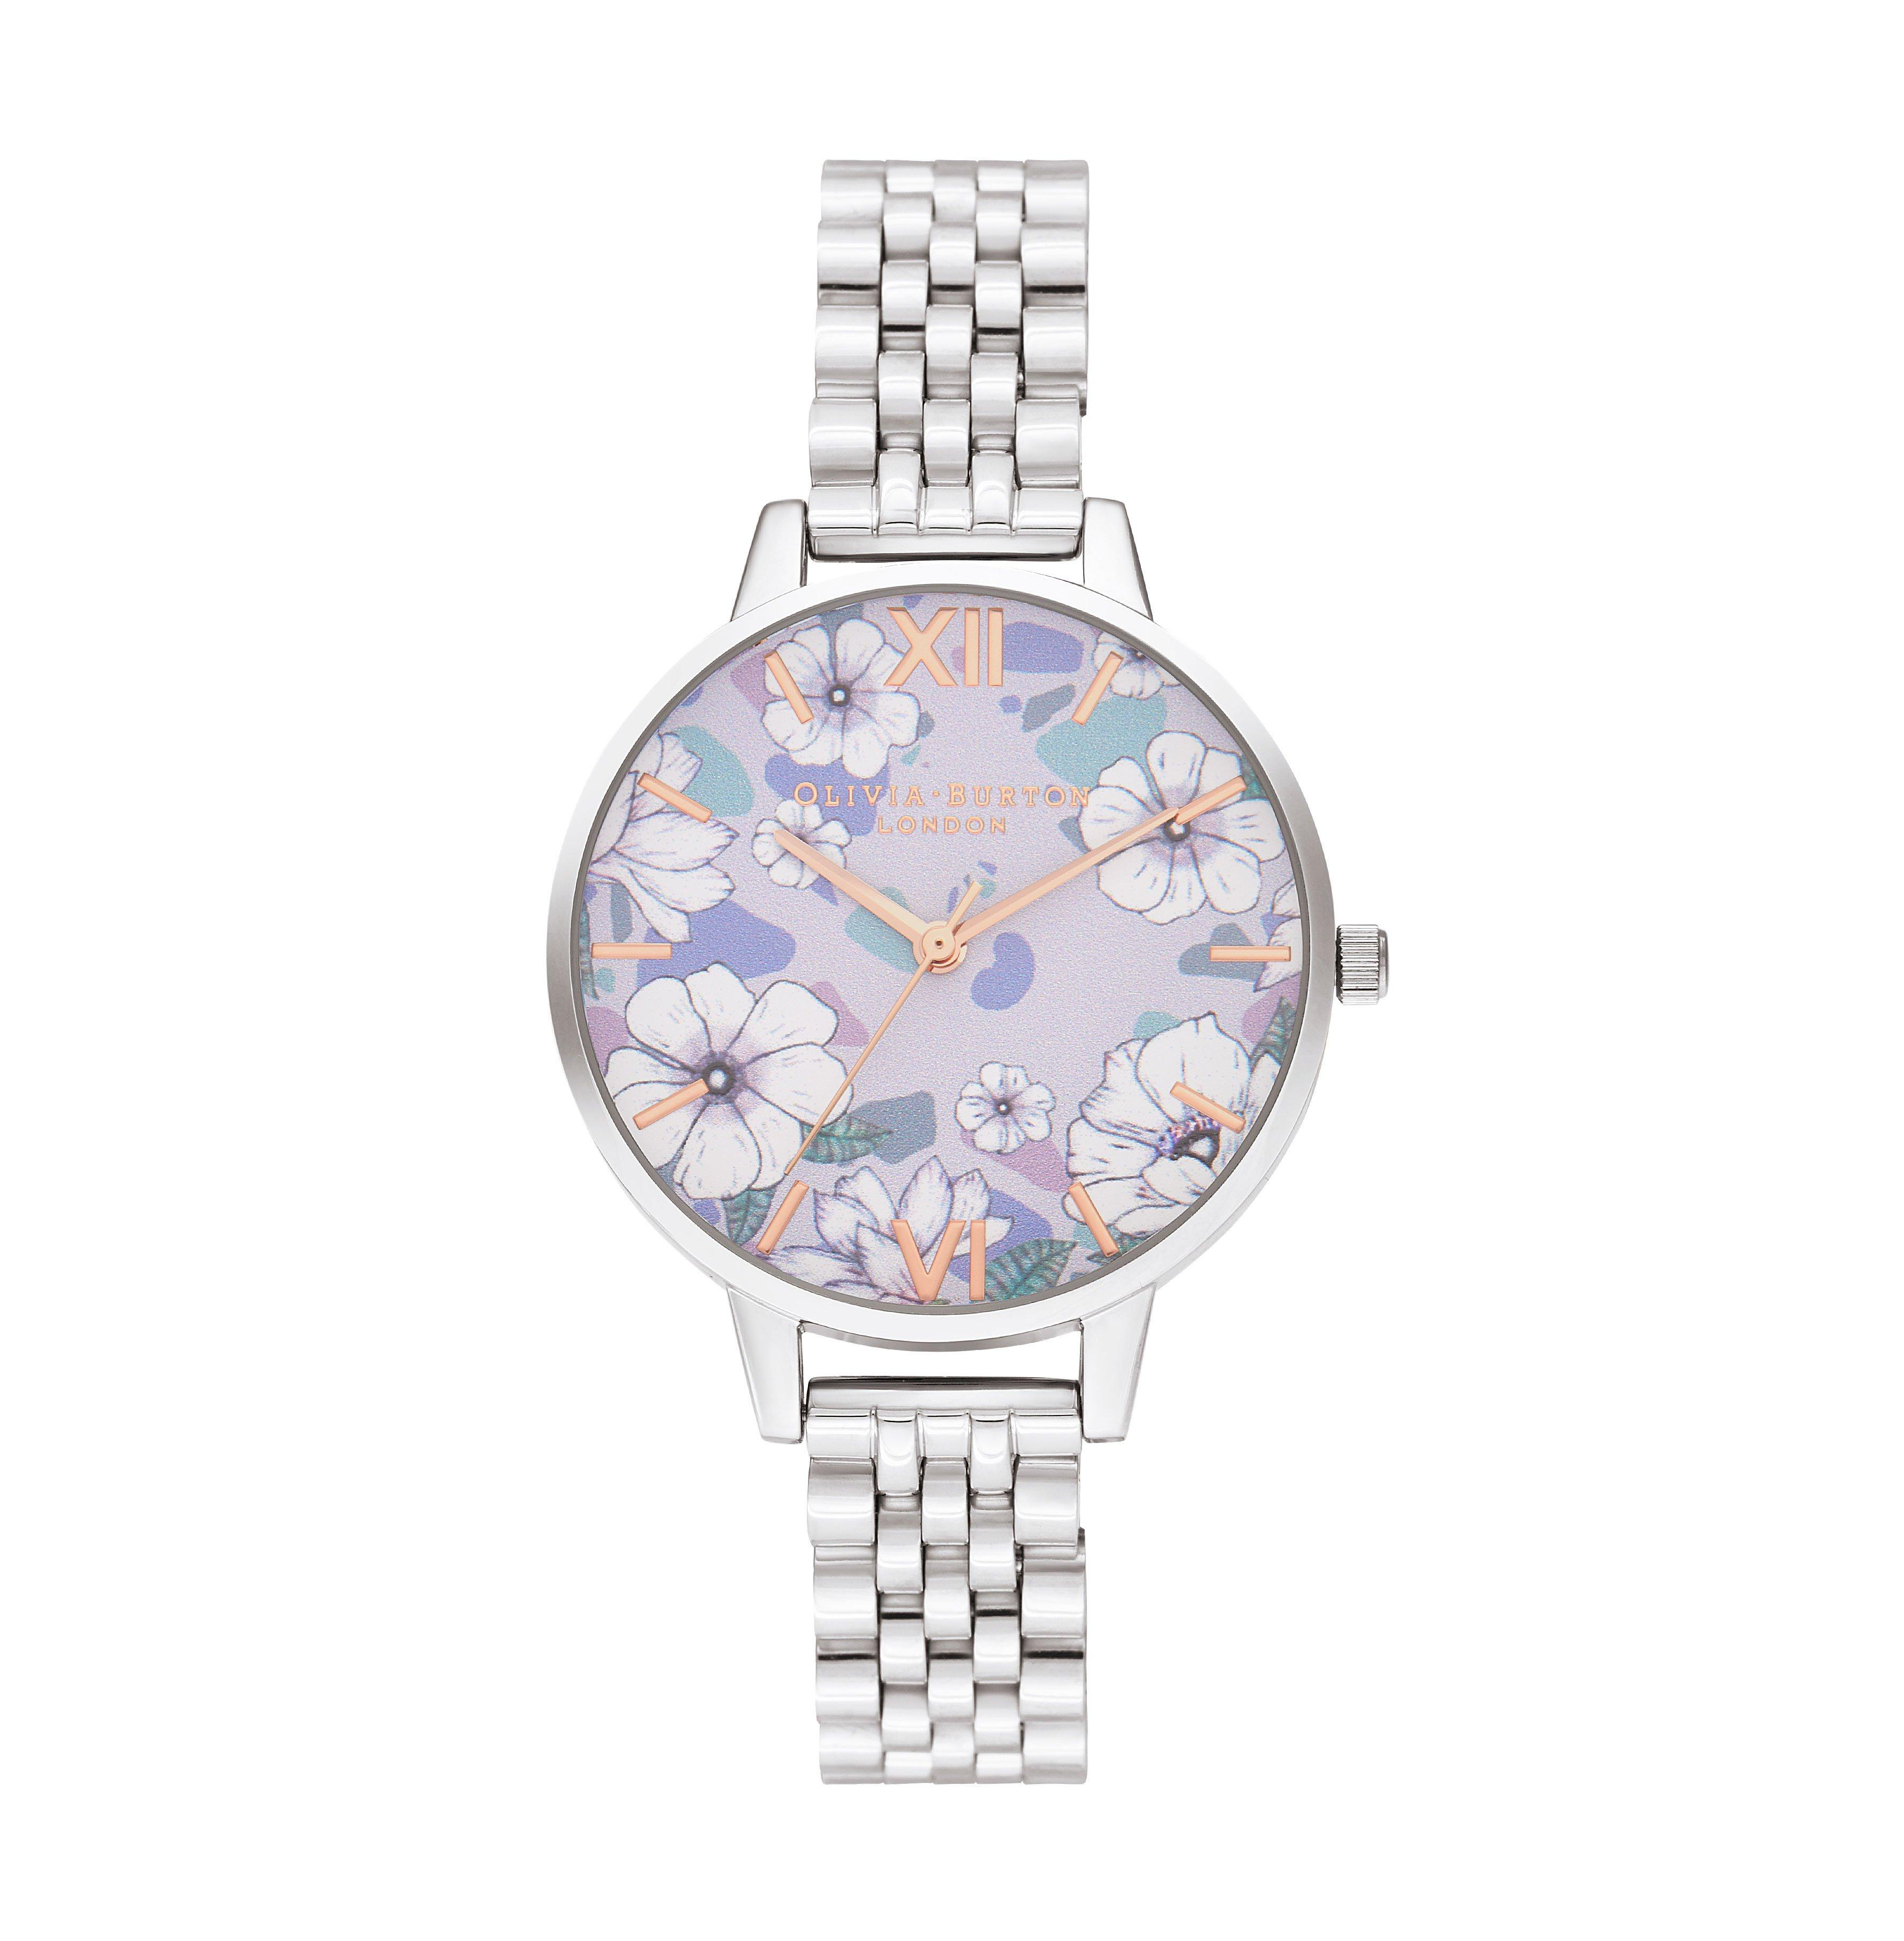 Olivia Burton Groovy Blooms Ladies Watch